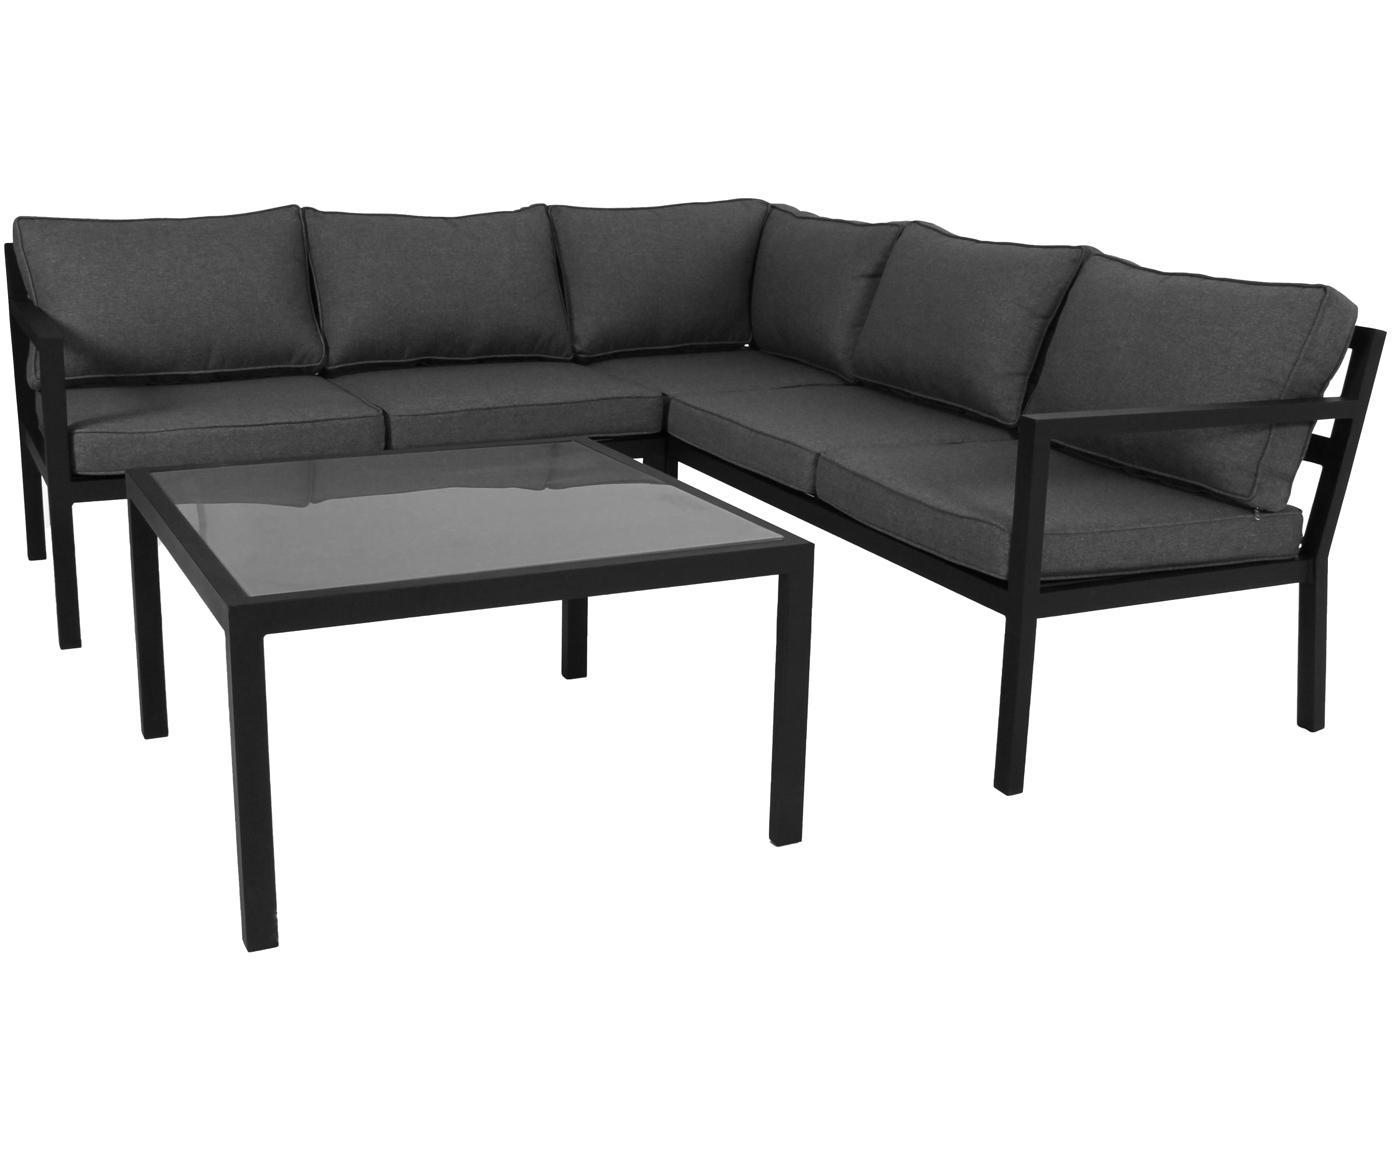 Set lounge exterior Joliette, 2pzas., Estructura: aluminio con pintura en p, Tapizado: olefina, Estructura: aluminio, Tablero: vidrio, Negro, gris oscuro, Tamaños diferentes